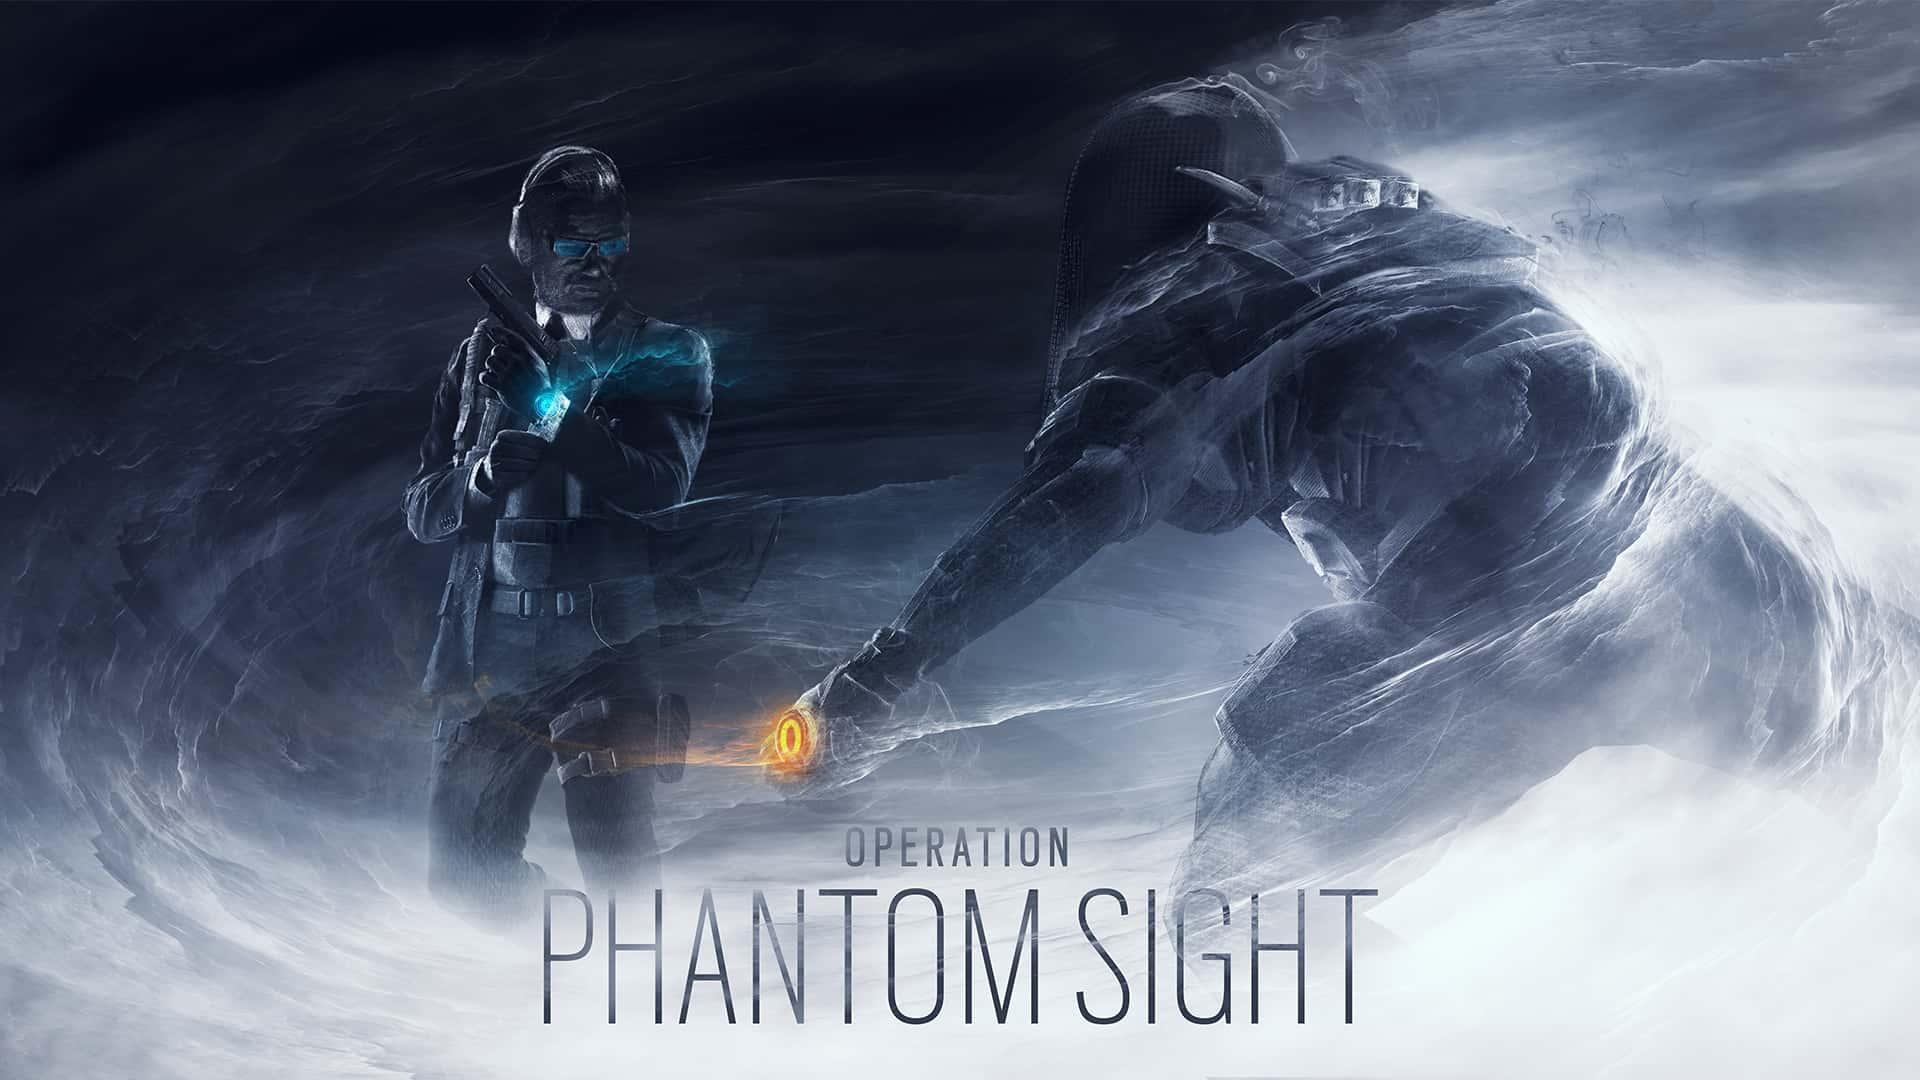 Tom Clancy's Rainbow Six Siege Operation Phantom Sight Will Be Available Tomorrow